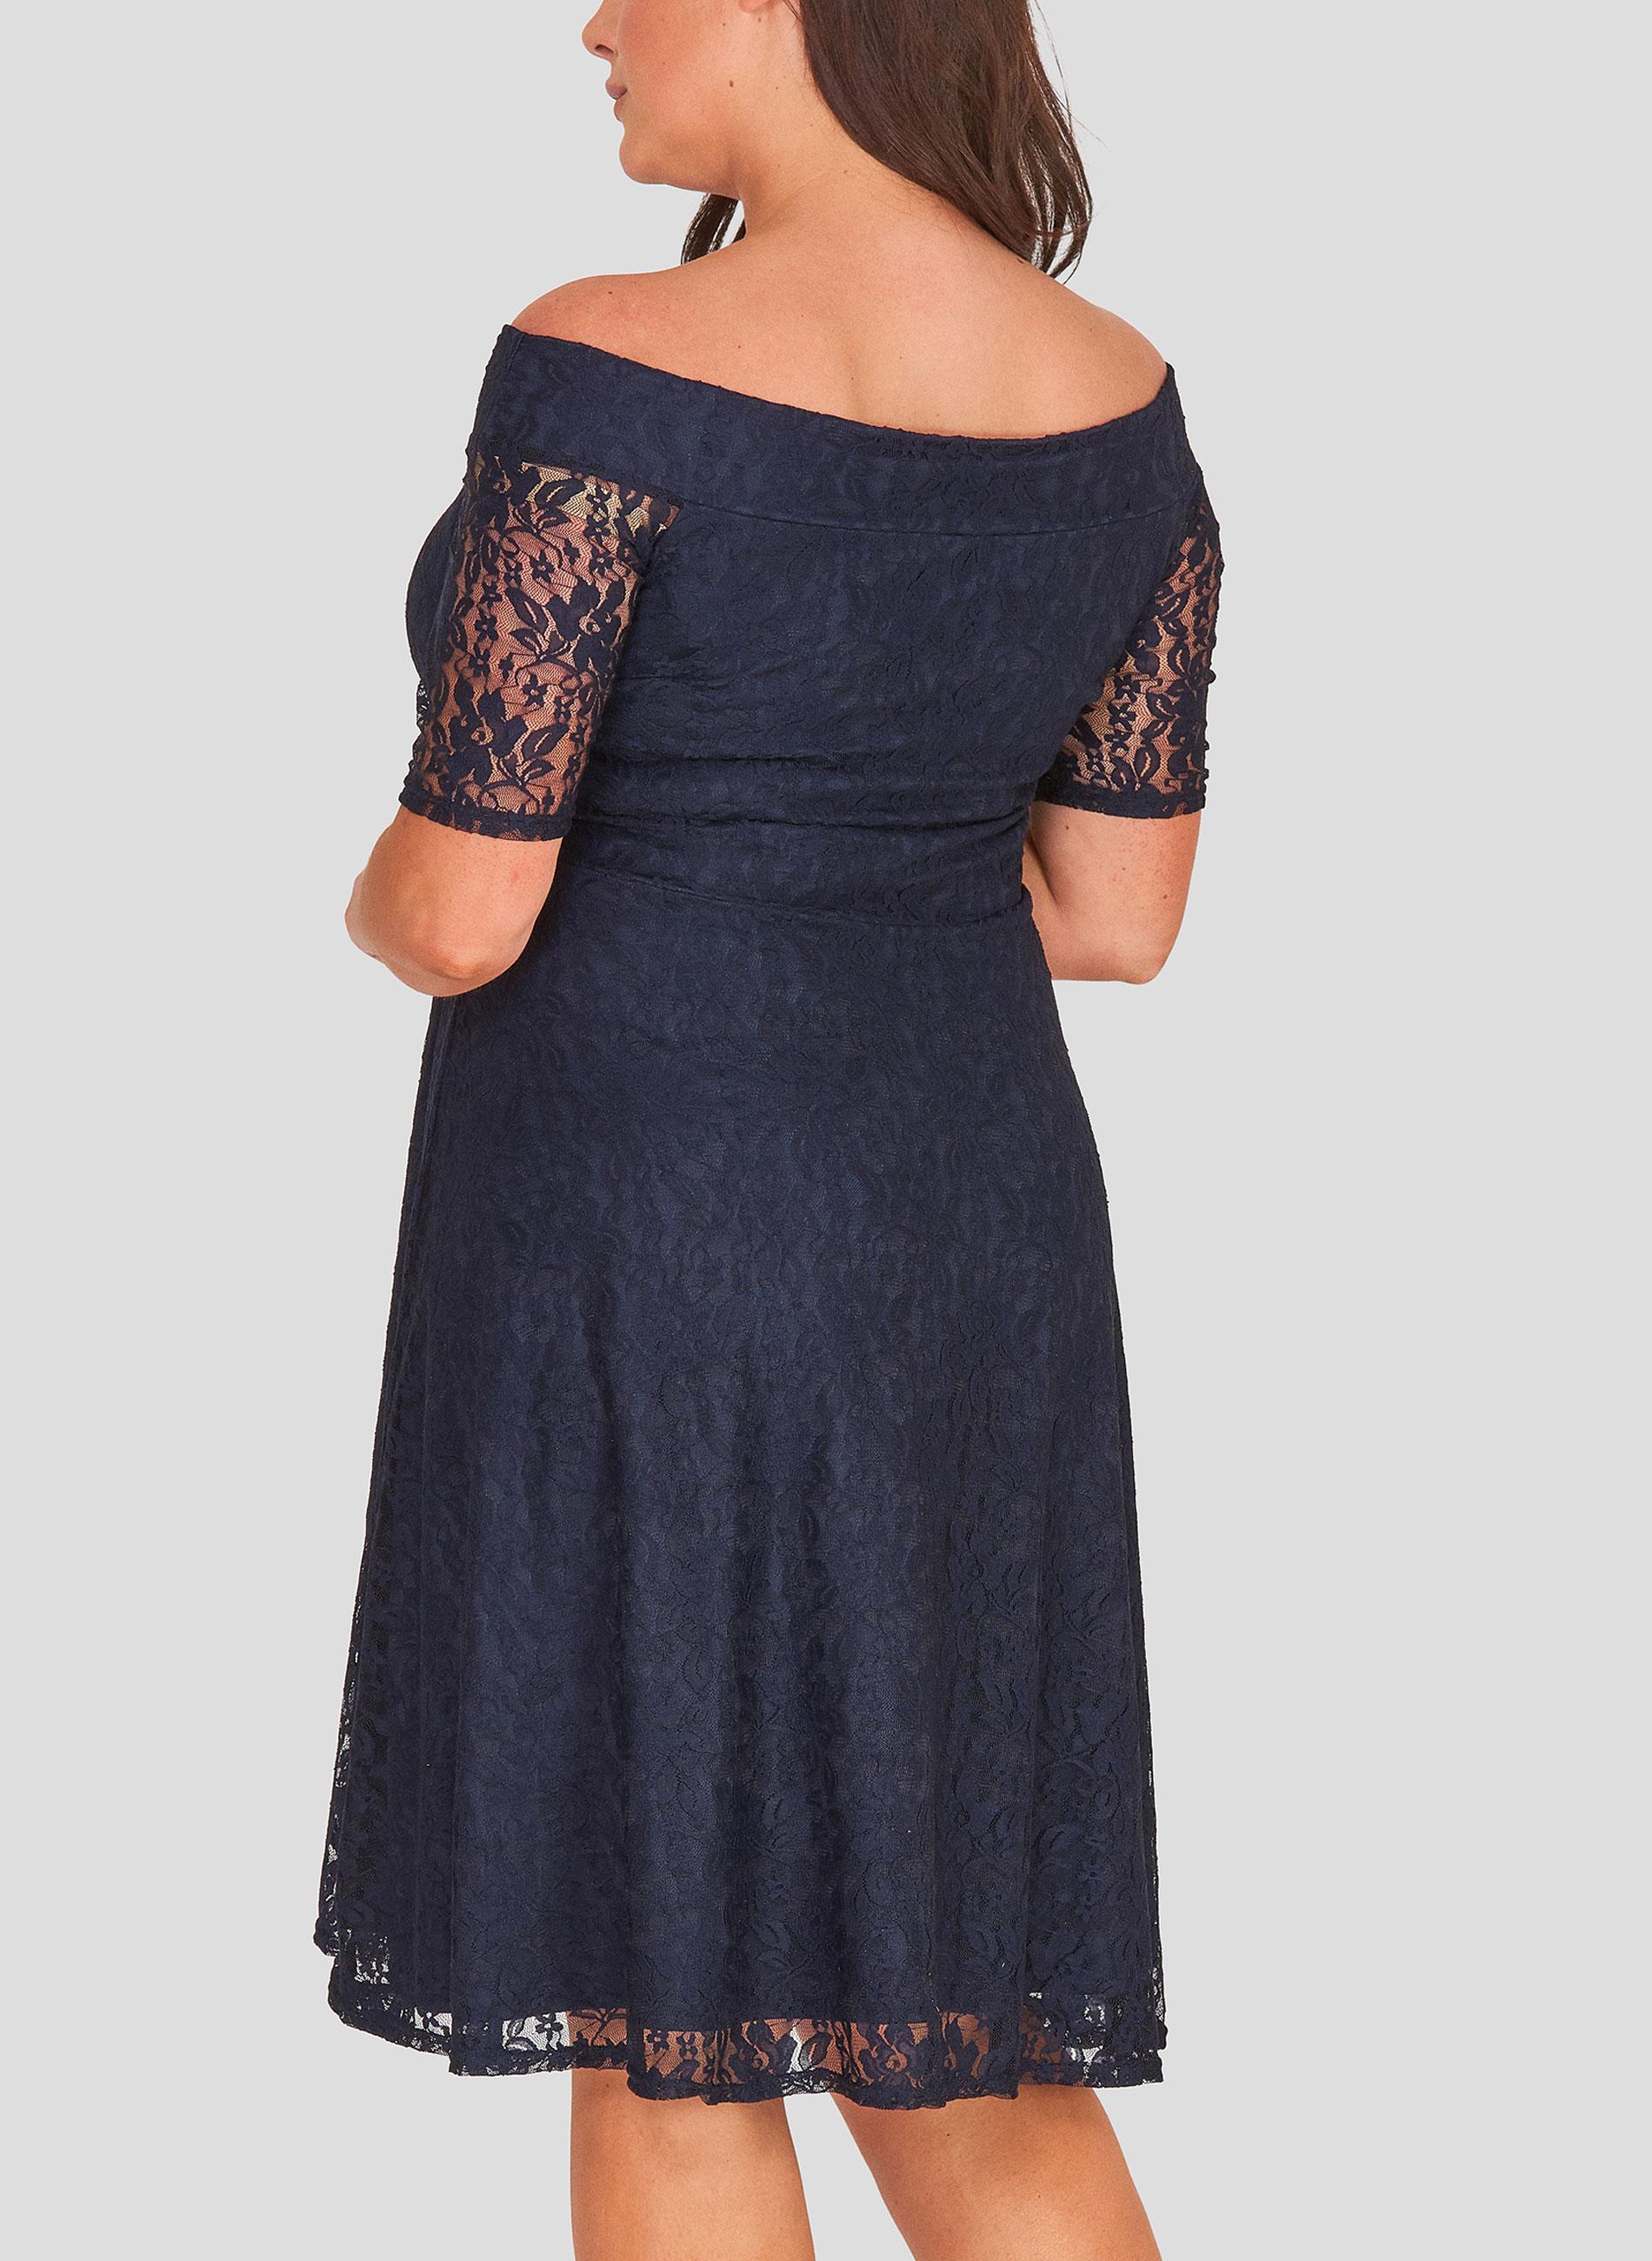 a6029c24e5ec ΜΕΓΑΛΑ ΜΕΓΕΘΗ ΦΟΡΕΜΑΤΑ :: Φόρεμα Έξωμο Navy Δαντέλα - Μόδα σε μεγάλα ...